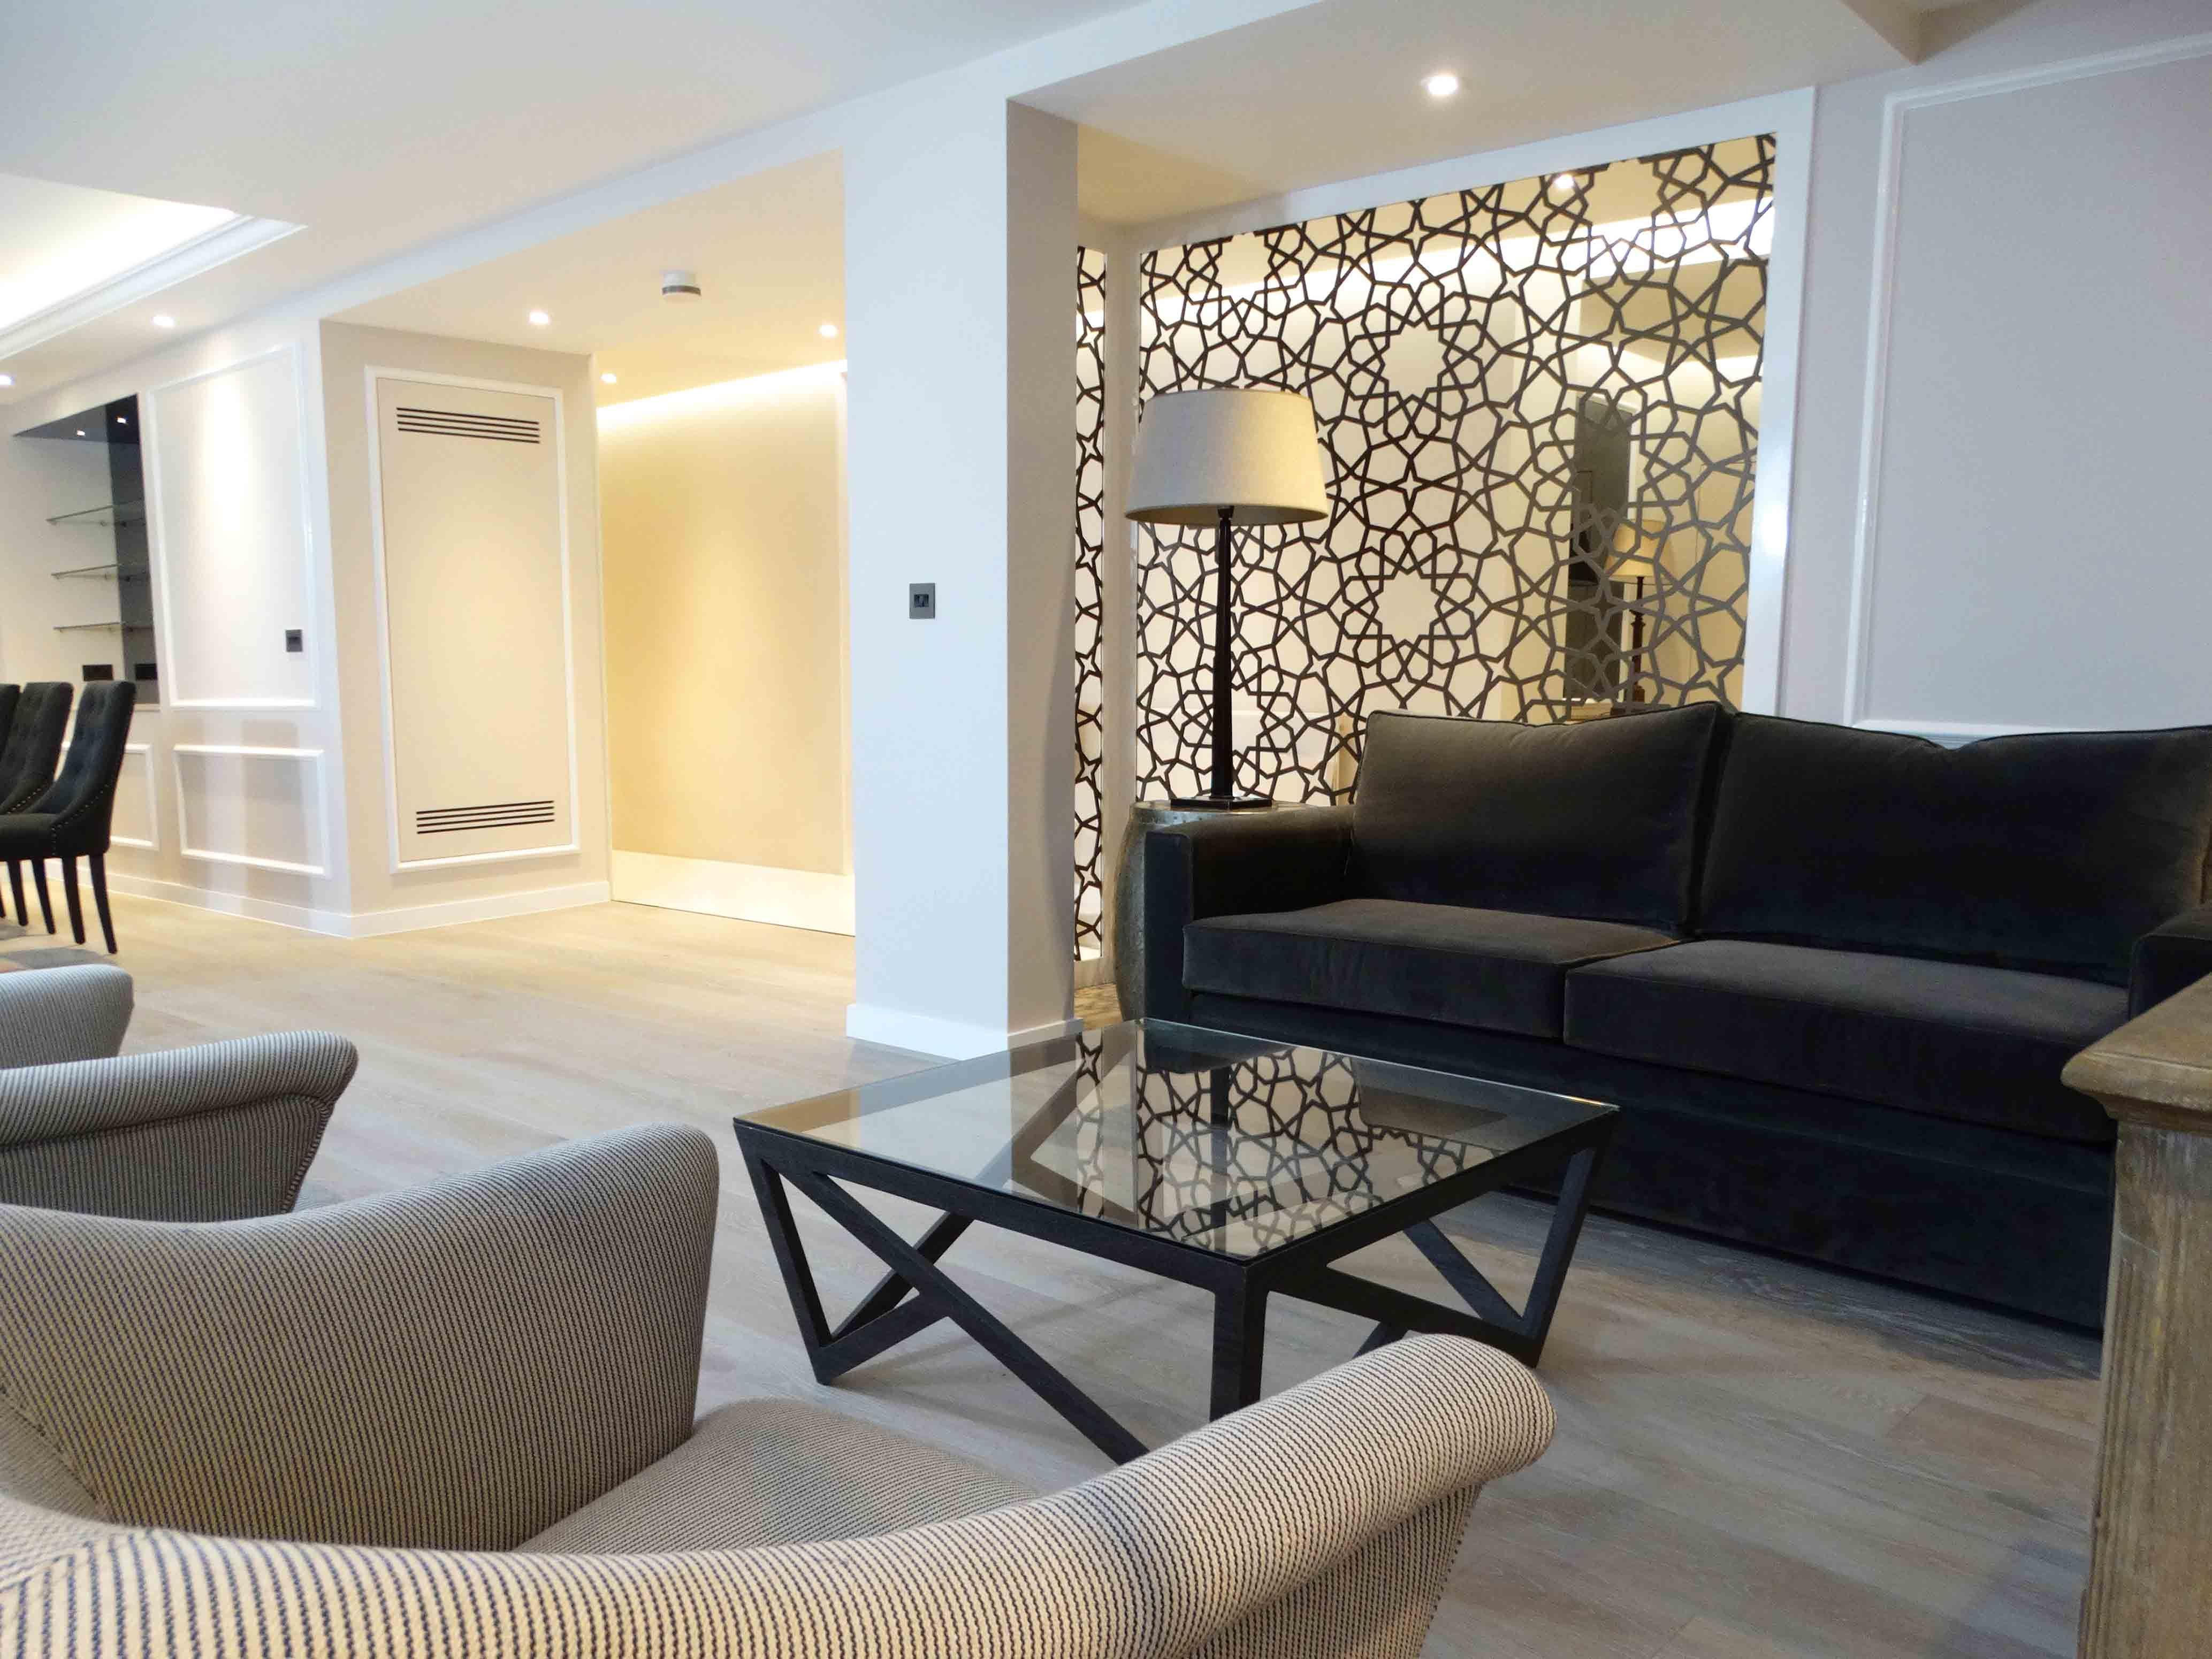 Mobili Rampazzo ~ 16 best lounge images on pinterest living room ideas dinner